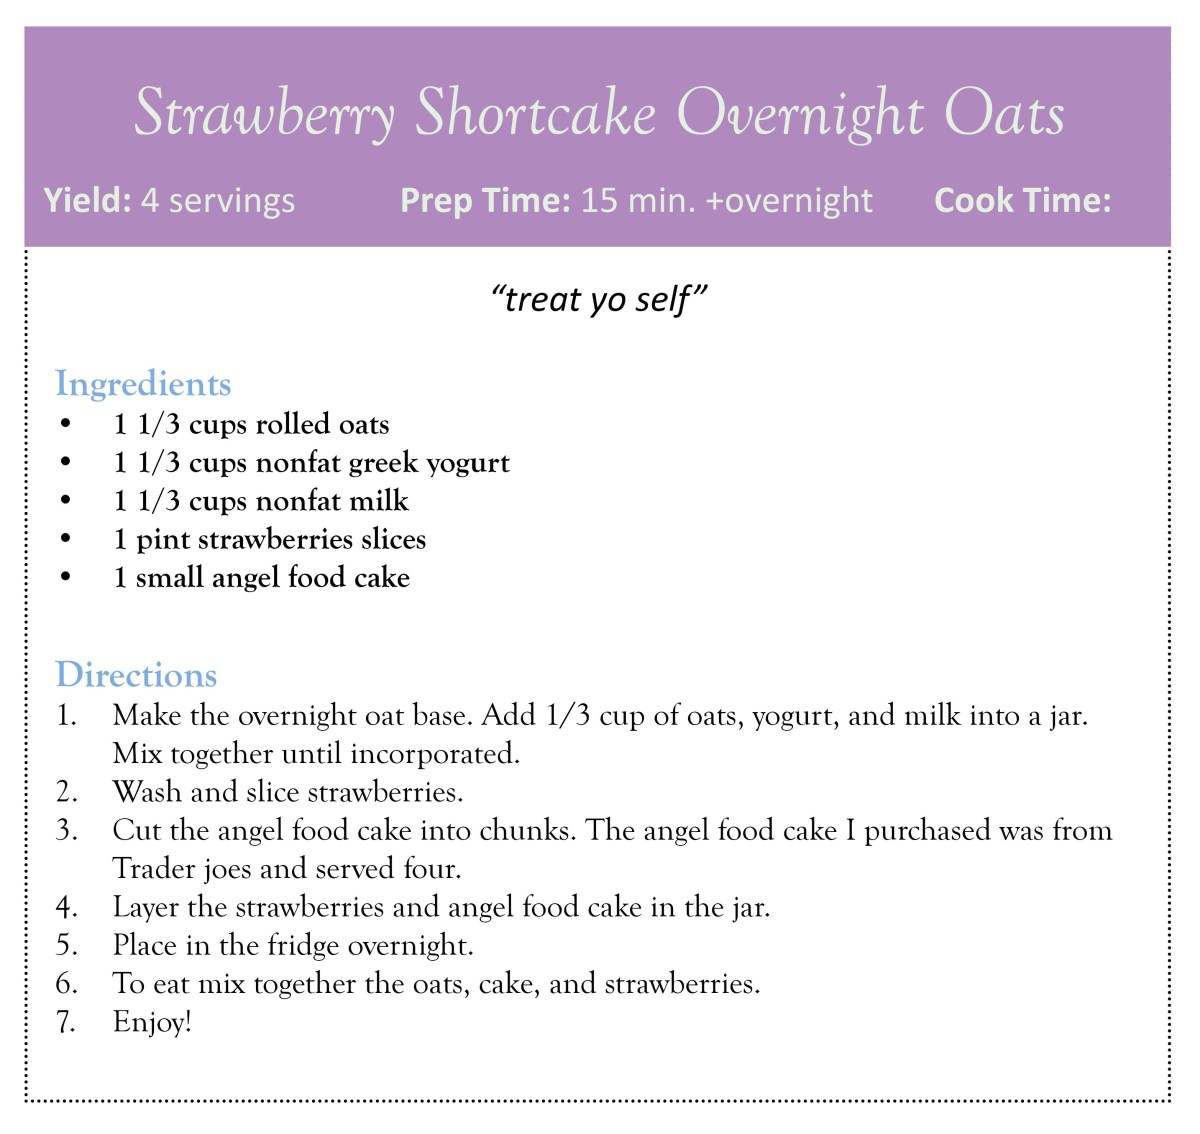 Strawberry shortcake overnight oats.jpg